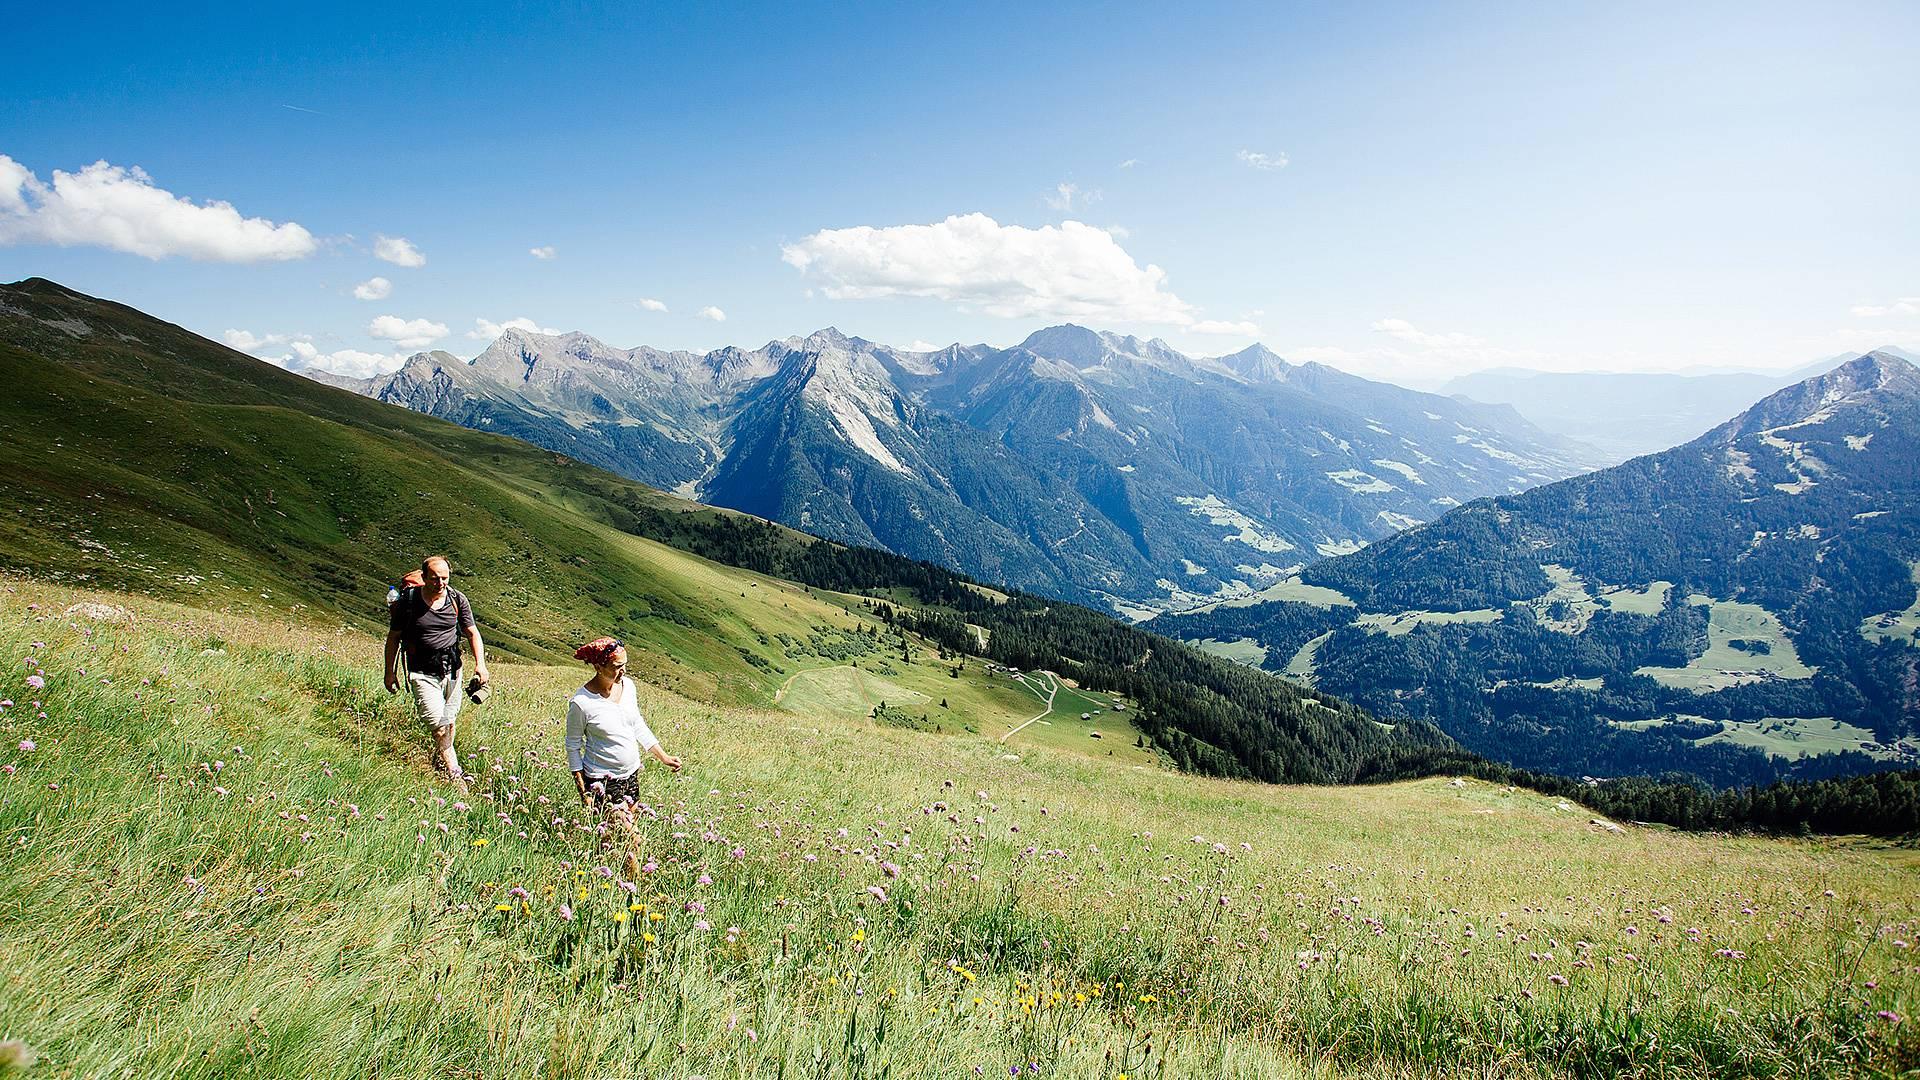 Hiking In Val Passiria Passeiertal Simply Wonderful